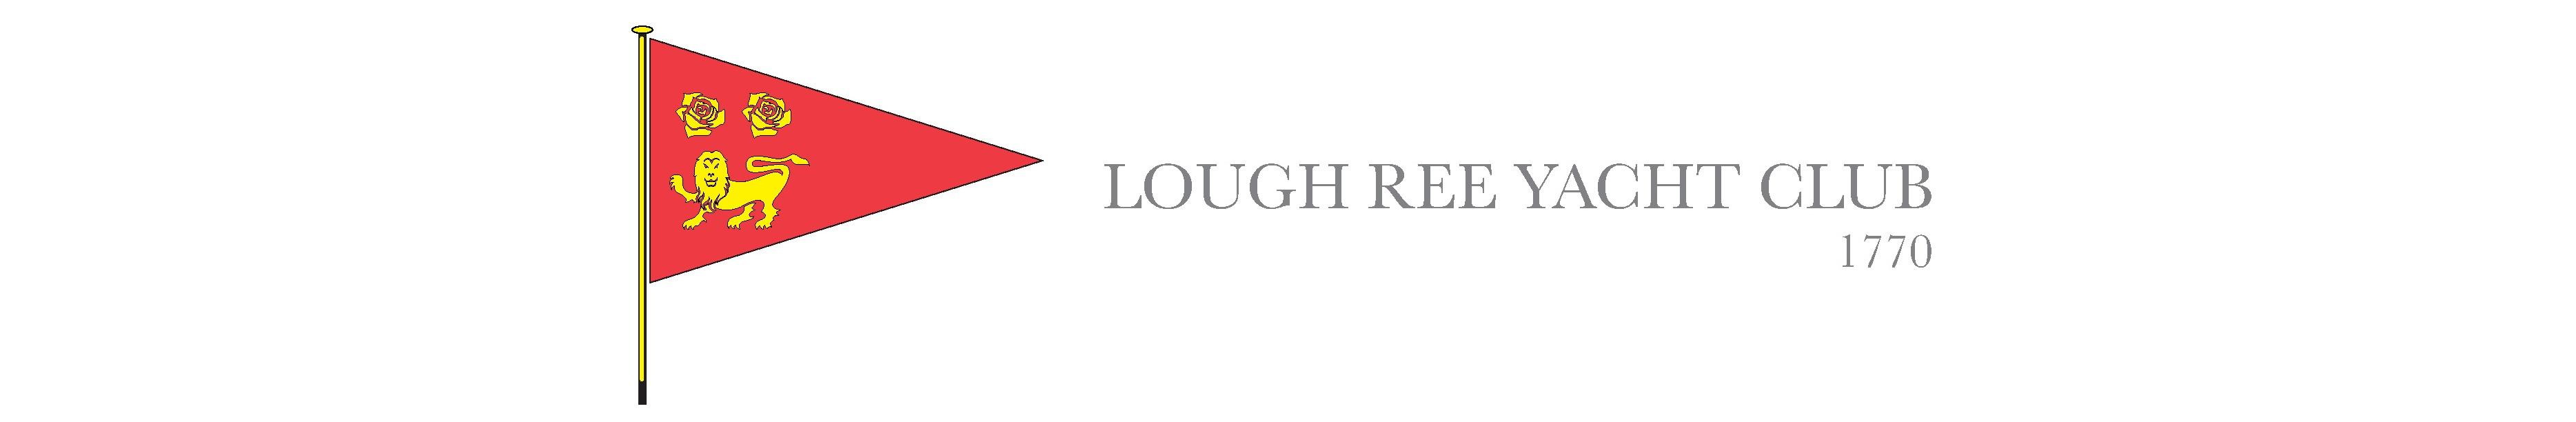 Lough Ree Yacht Club